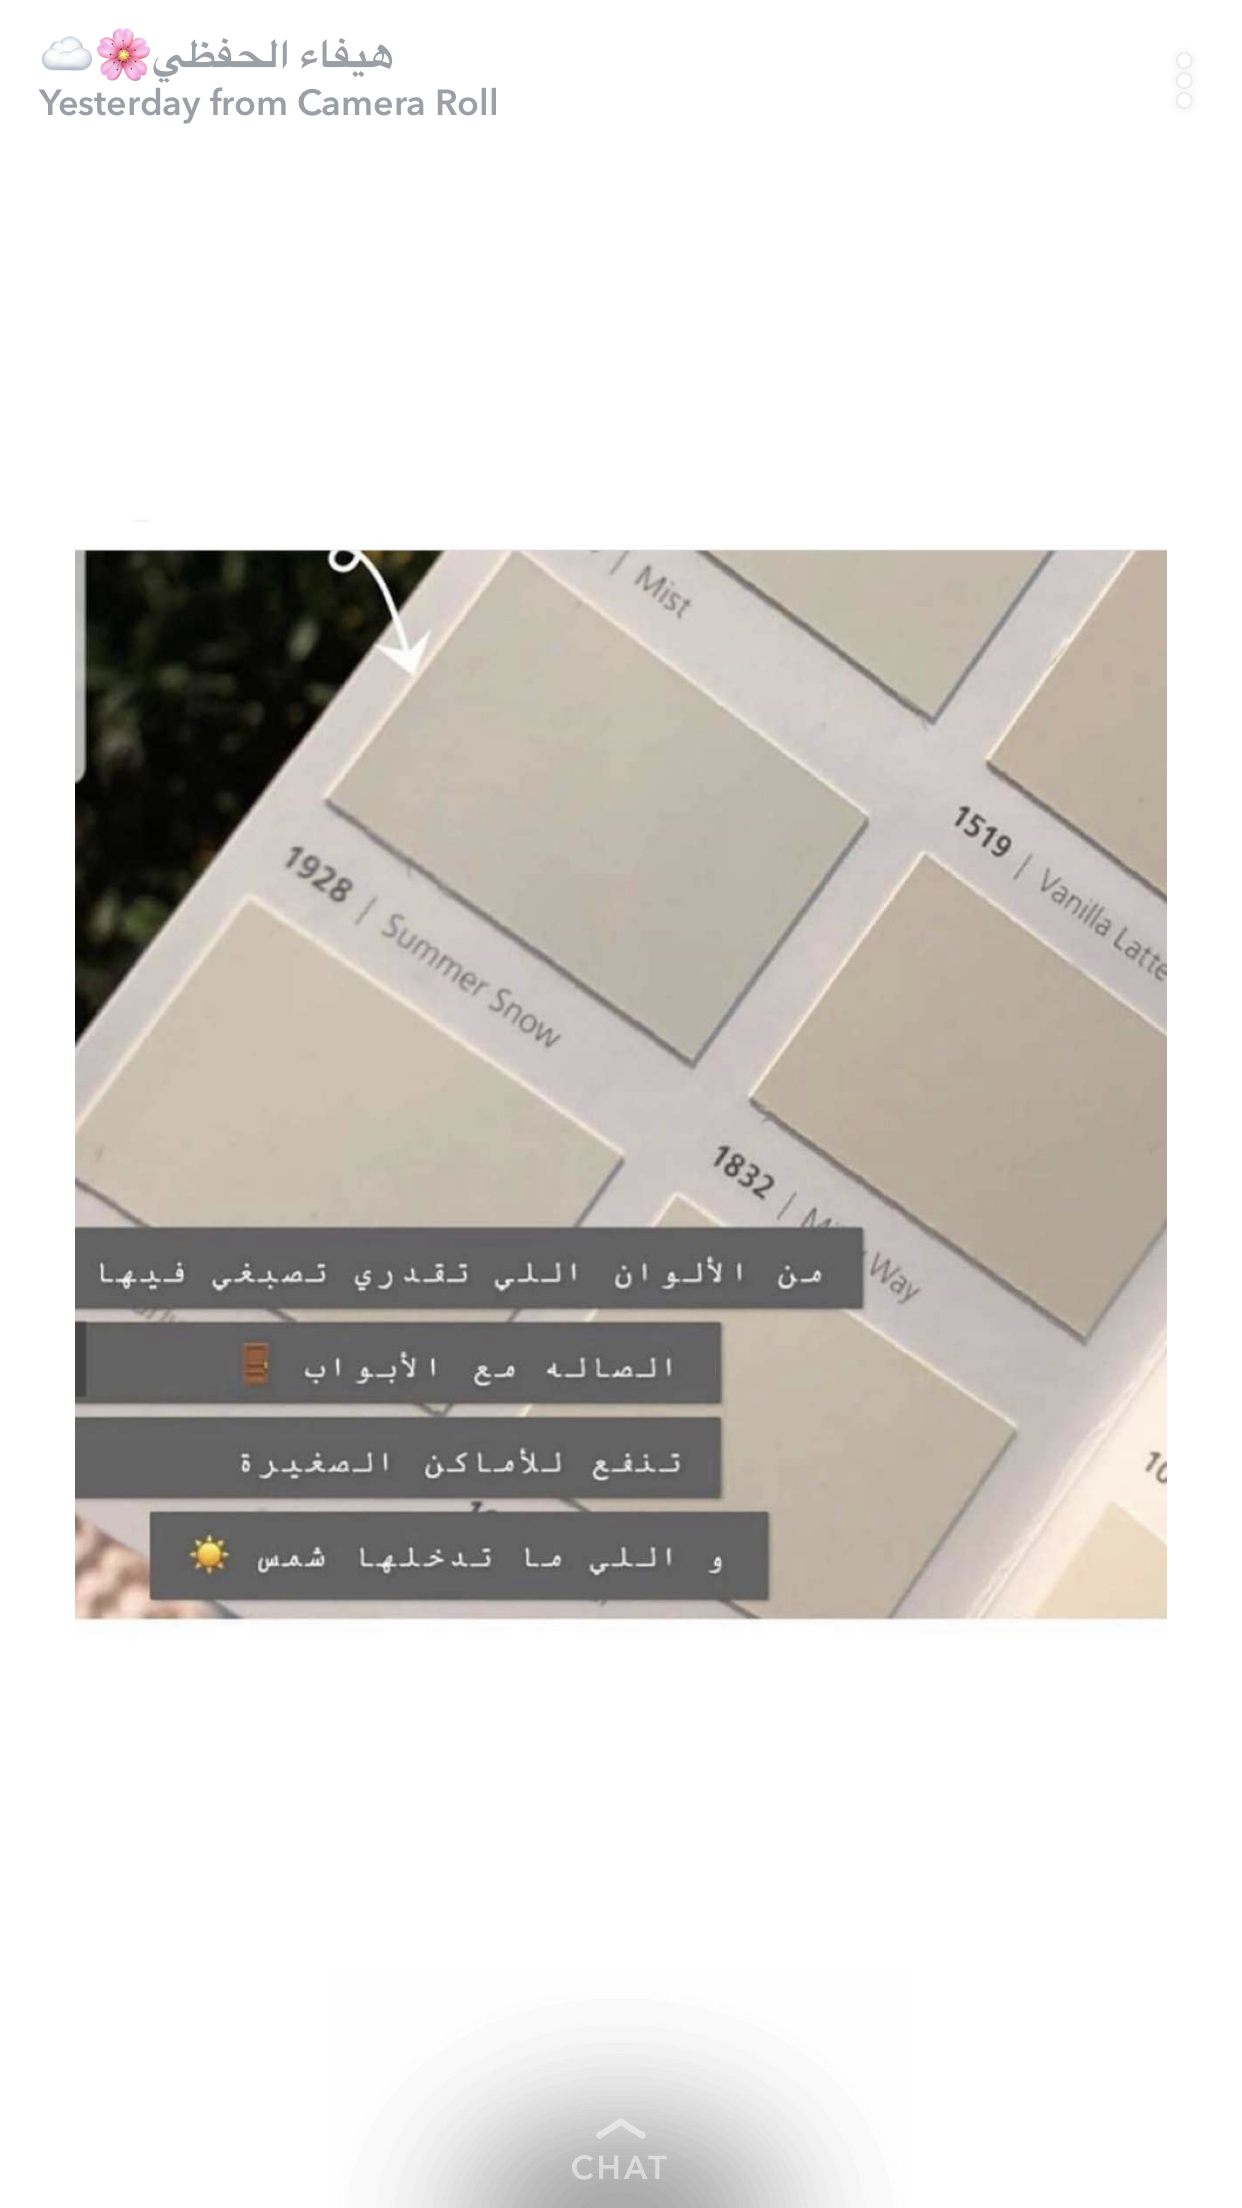 Pin By Ashwaq Alharbi On Wall Paints Home Goods Decor Spa Bathroom Decor House Interior Decor